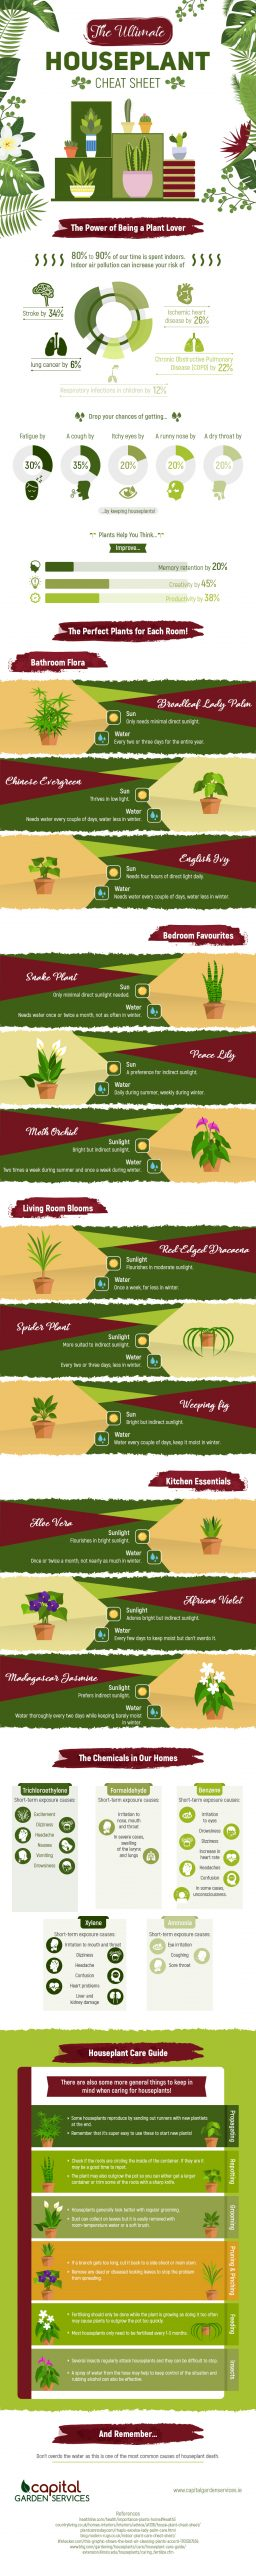 Houseplants - cheat sheet